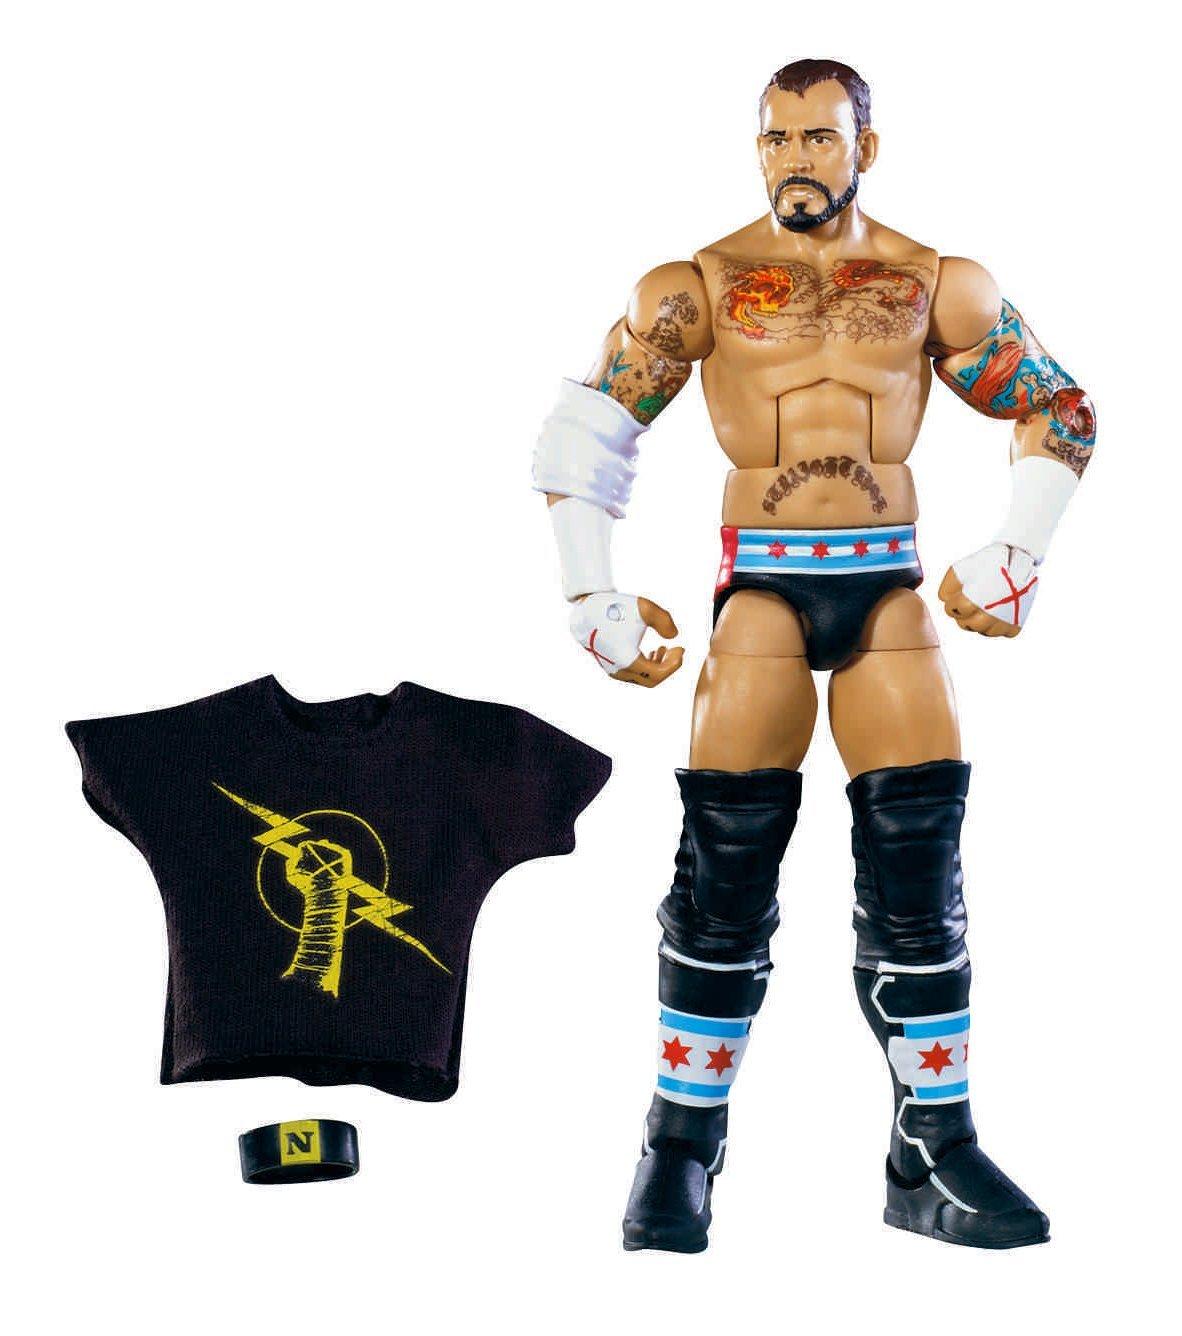 Image - WWE Elite 11 CM Punk.jpg - Pro Wrestling Wiki - Divas, Knockouts, Results, Match ...